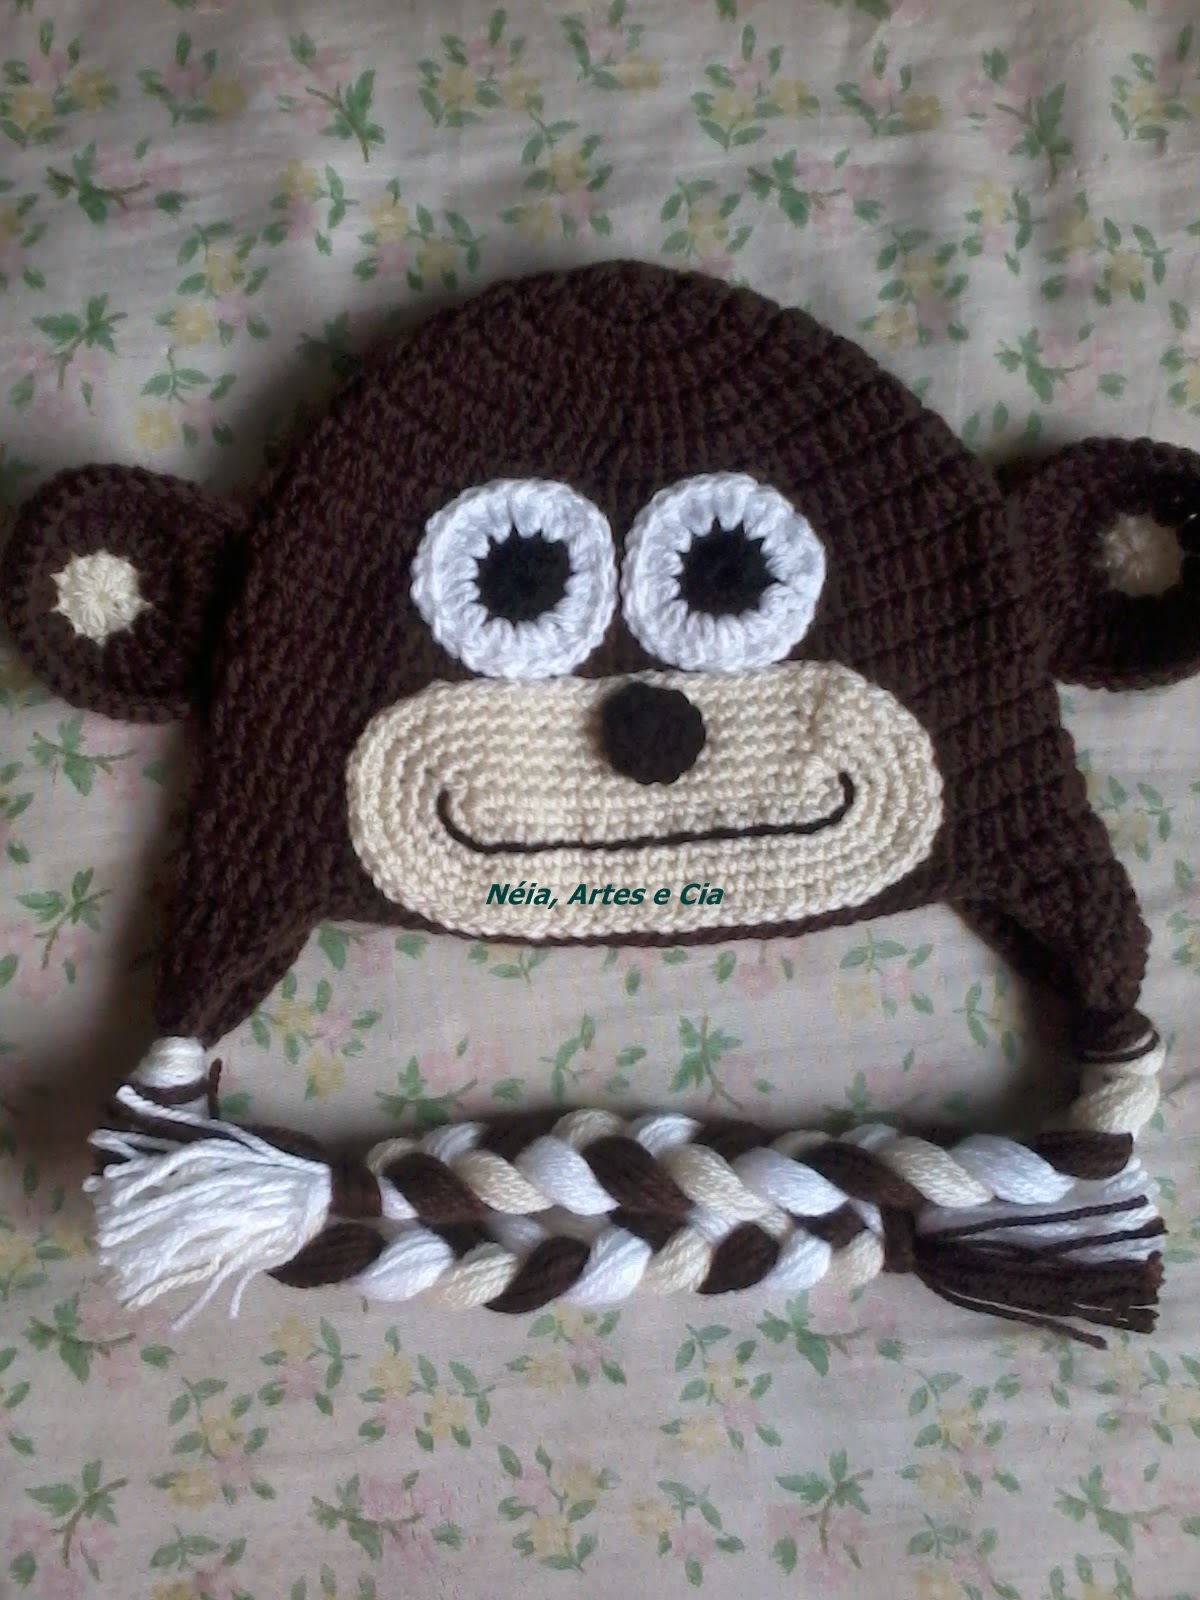 Tapete Minions De Croche : N?ia, artes e cia: Toucas de croch? Minions, Macaco e Monstros